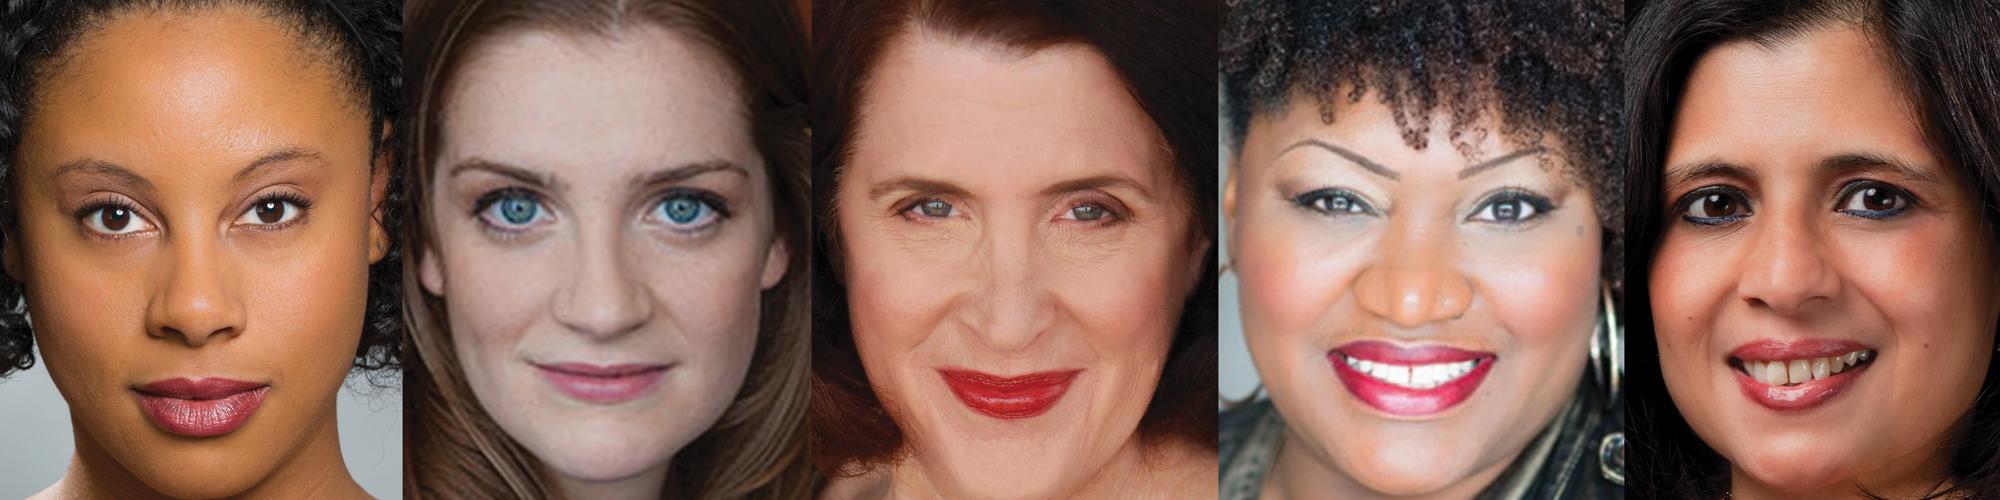 cast of PRINCIPAL PRINCIPLE: Elena Flory-Barnes, Brenda Joyner, Joanne Klein, Shaunyce Omar, and Meenakshi Rishi